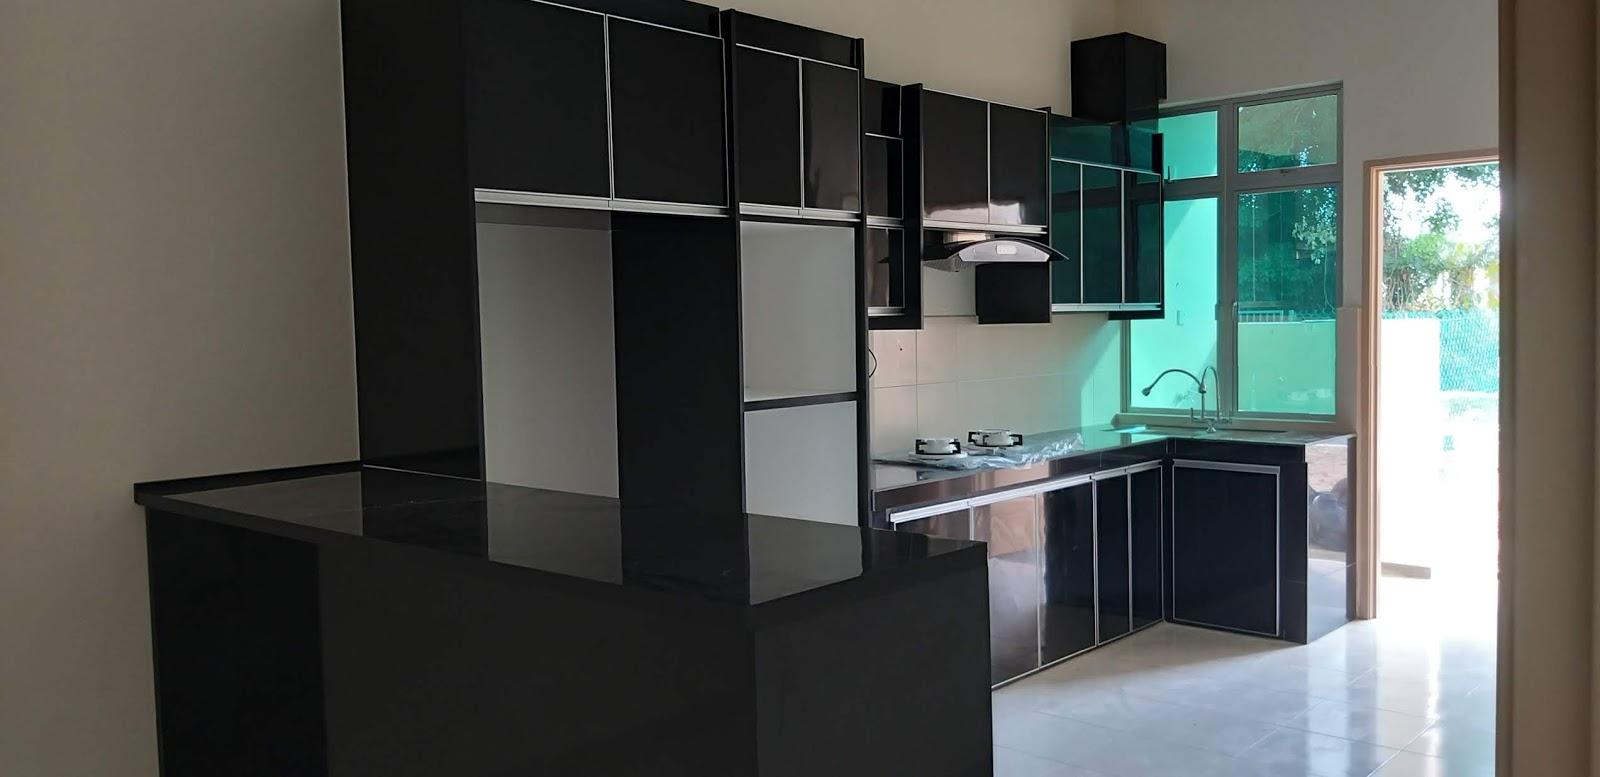 Kabinet Dapur Terus Dari Kilang Promosi Kabinet Dapur Raya 2019